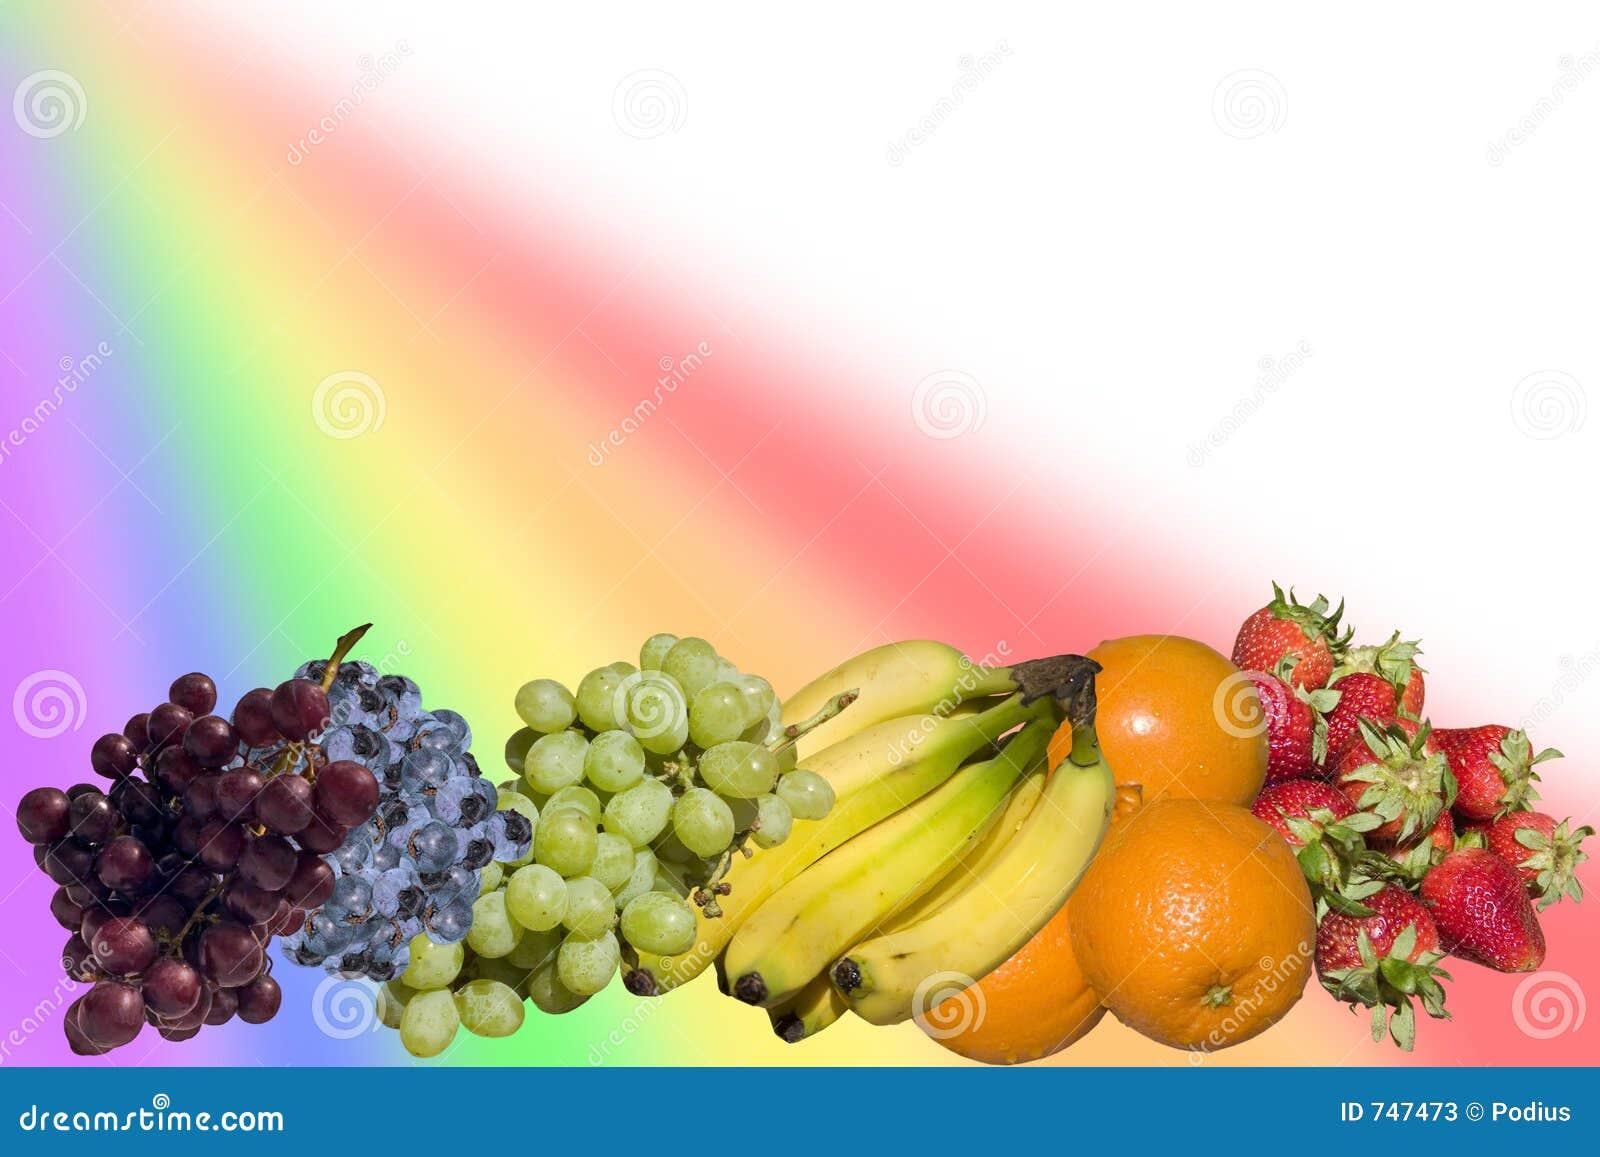 Rainbow bananas